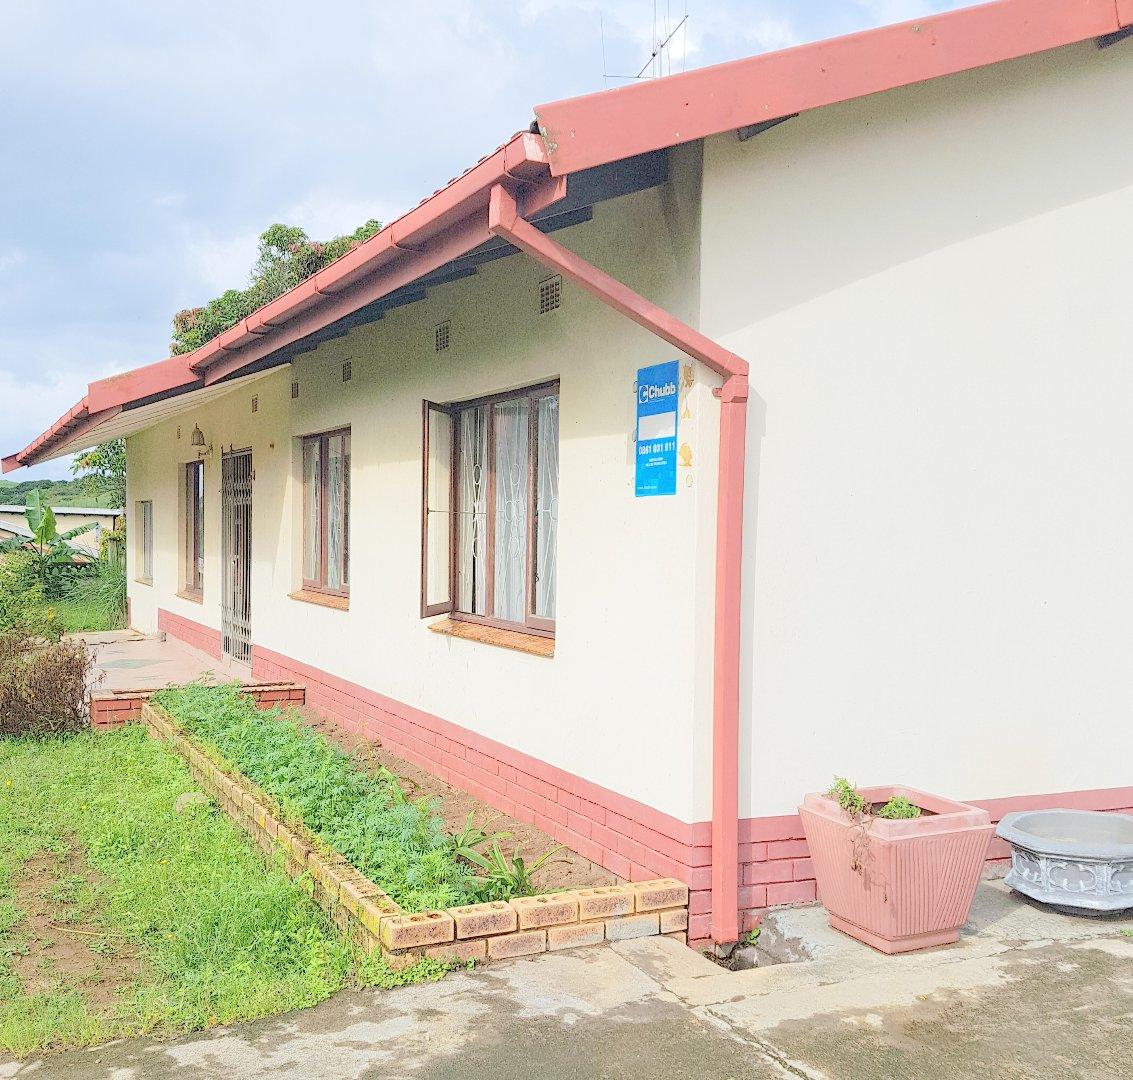 Umkomaas, Craigieburn Property  | Houses For Sale Craigieburn, Craigieburn, House 4 bedrooms property for sale Price:1,180,000